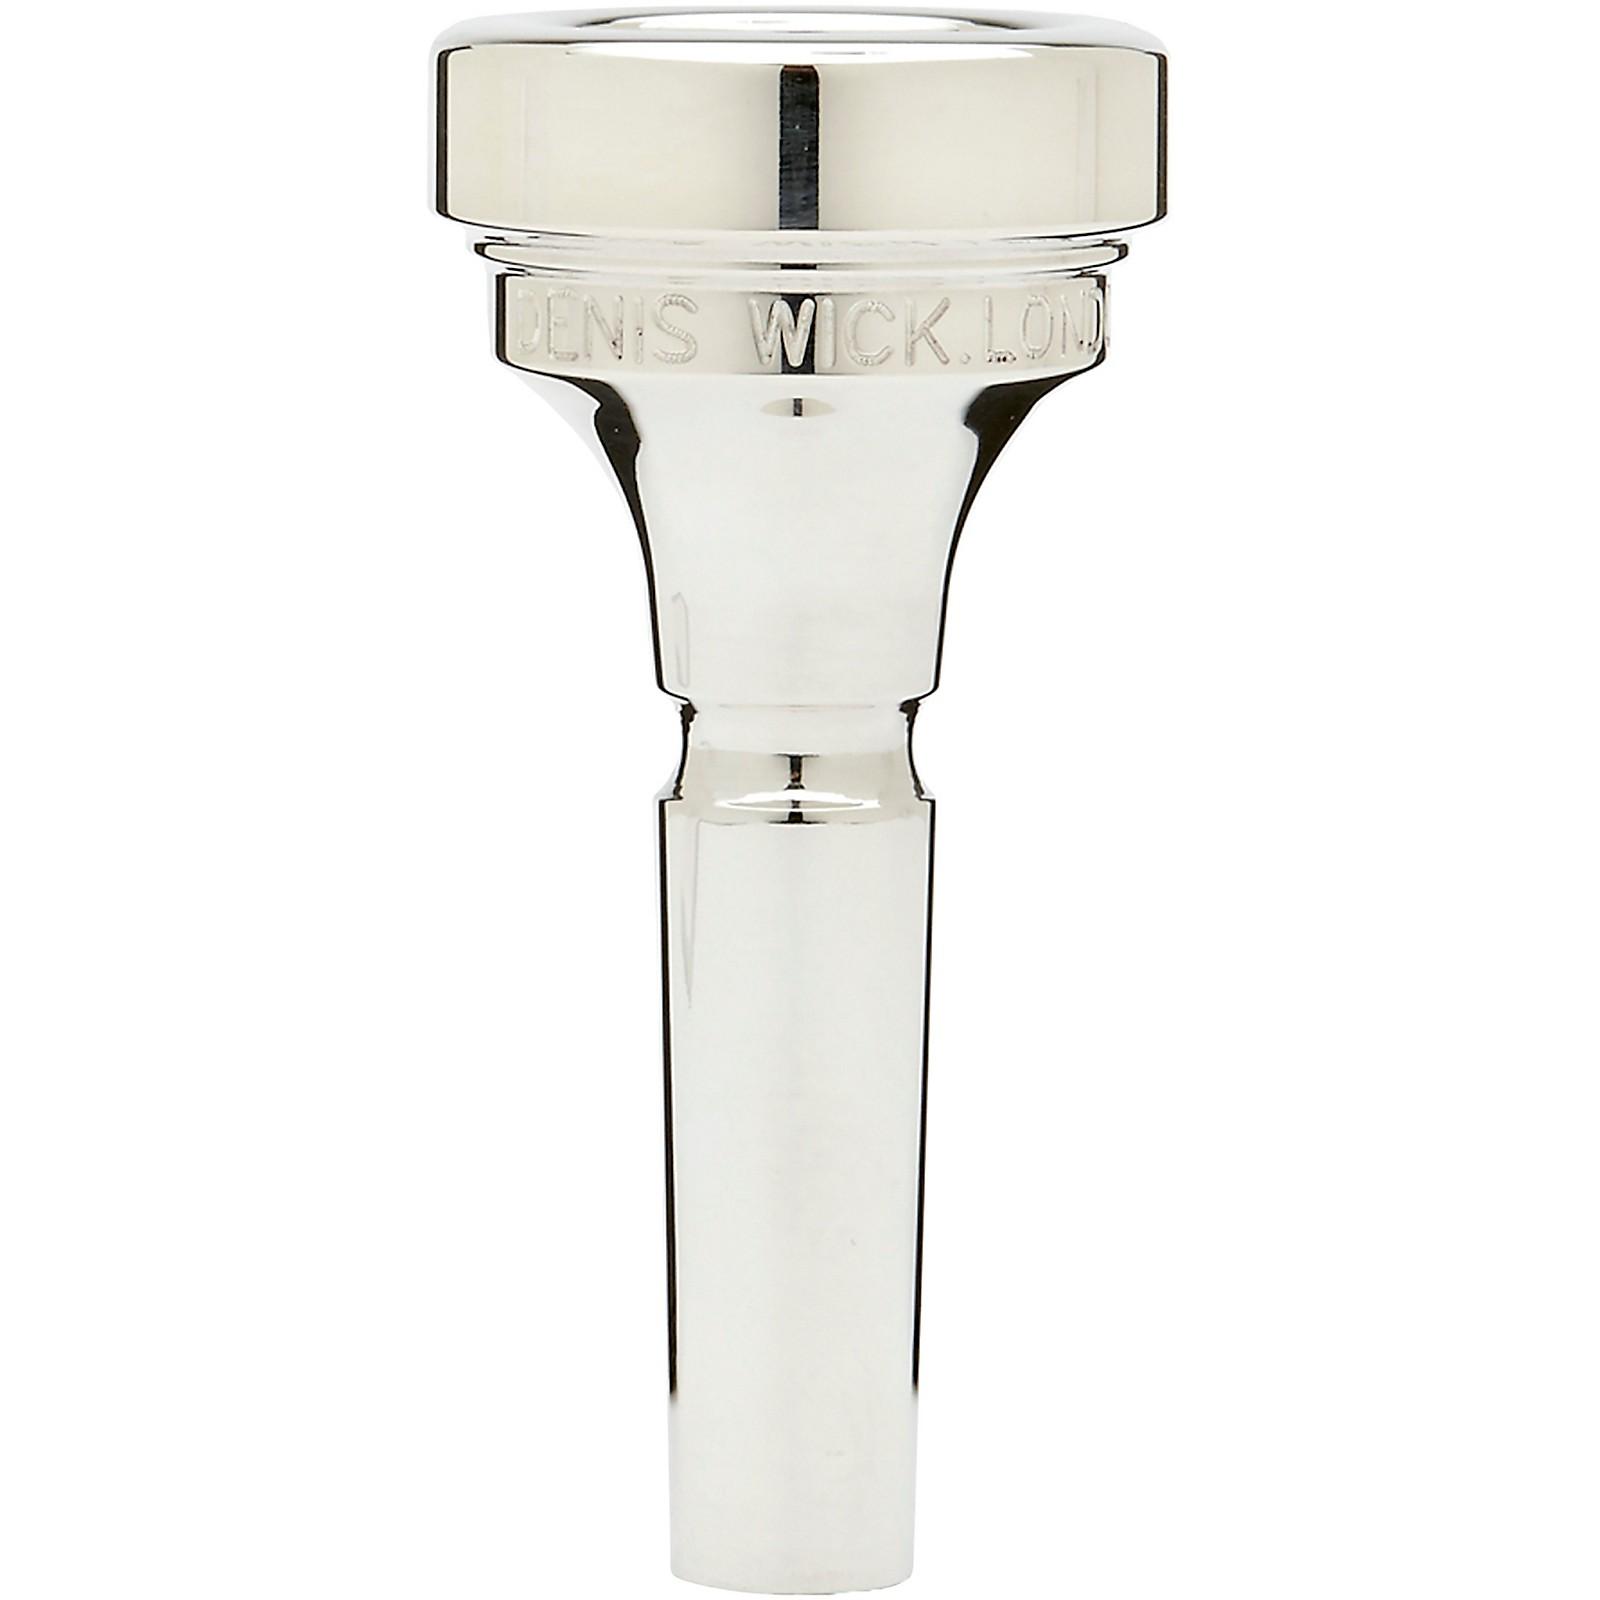 Denis Wick DW5880 Classic Series Trombone Mouthpiece in Silver